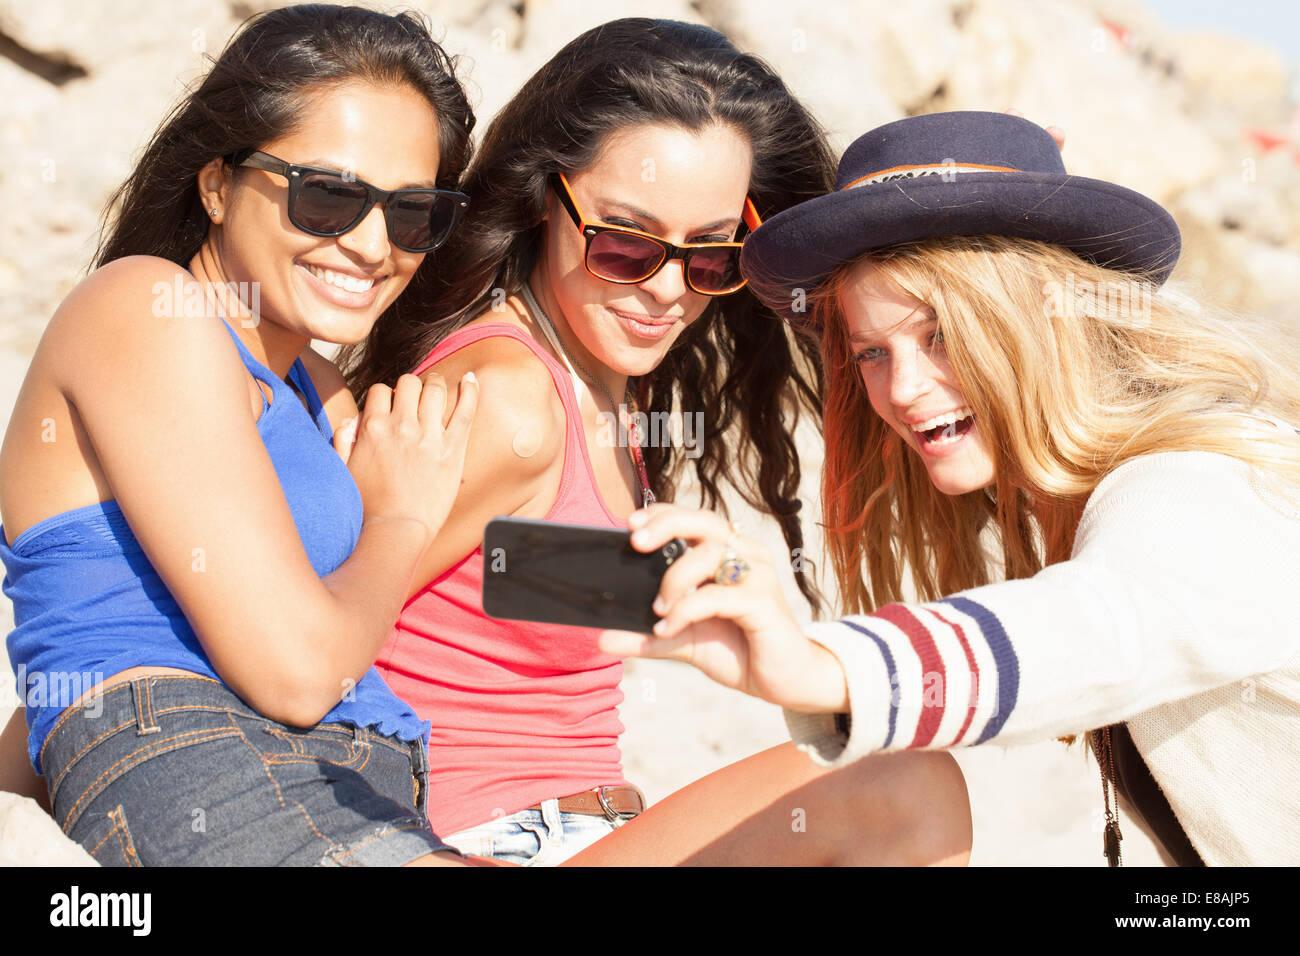 Trois jeunes femmes prenant des selfies smartphone on beach, Malibu, California, USA Photo Stock